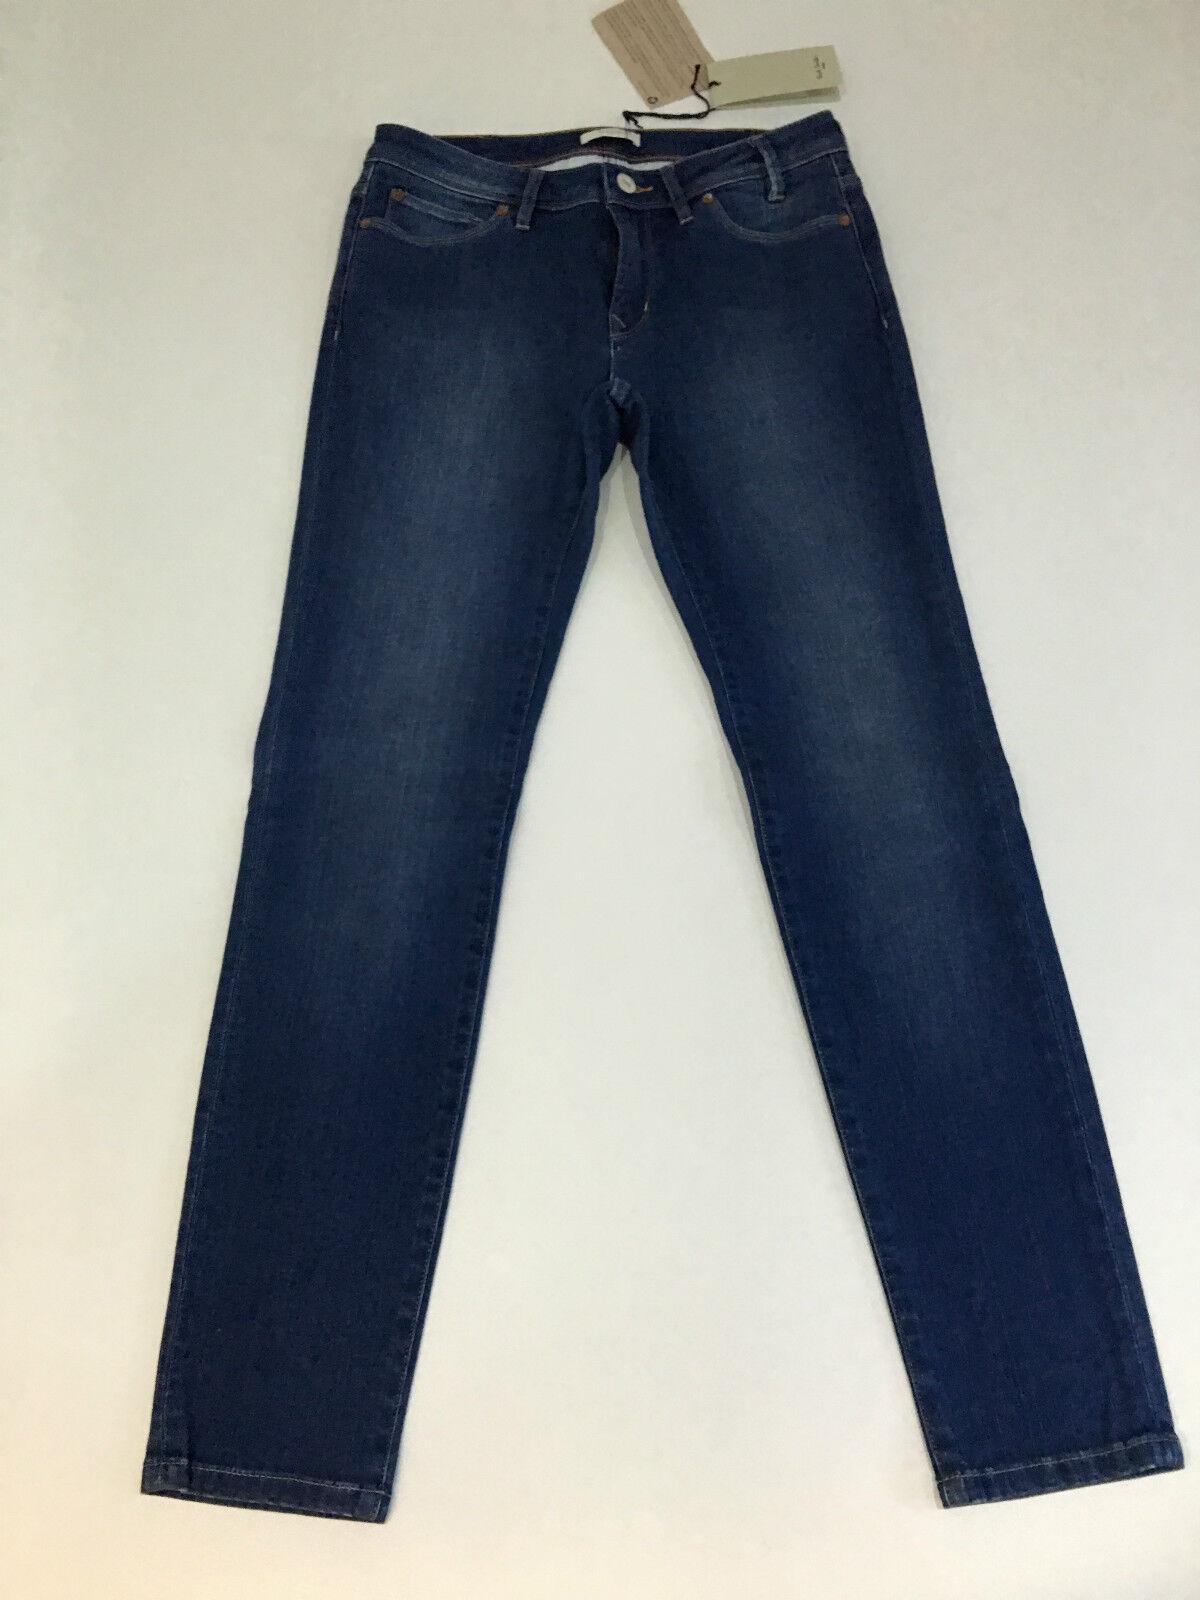 Paul Smith women Jeans 71.1cm Waist 68.6cm Leg 98%Algodón 2%Elastano